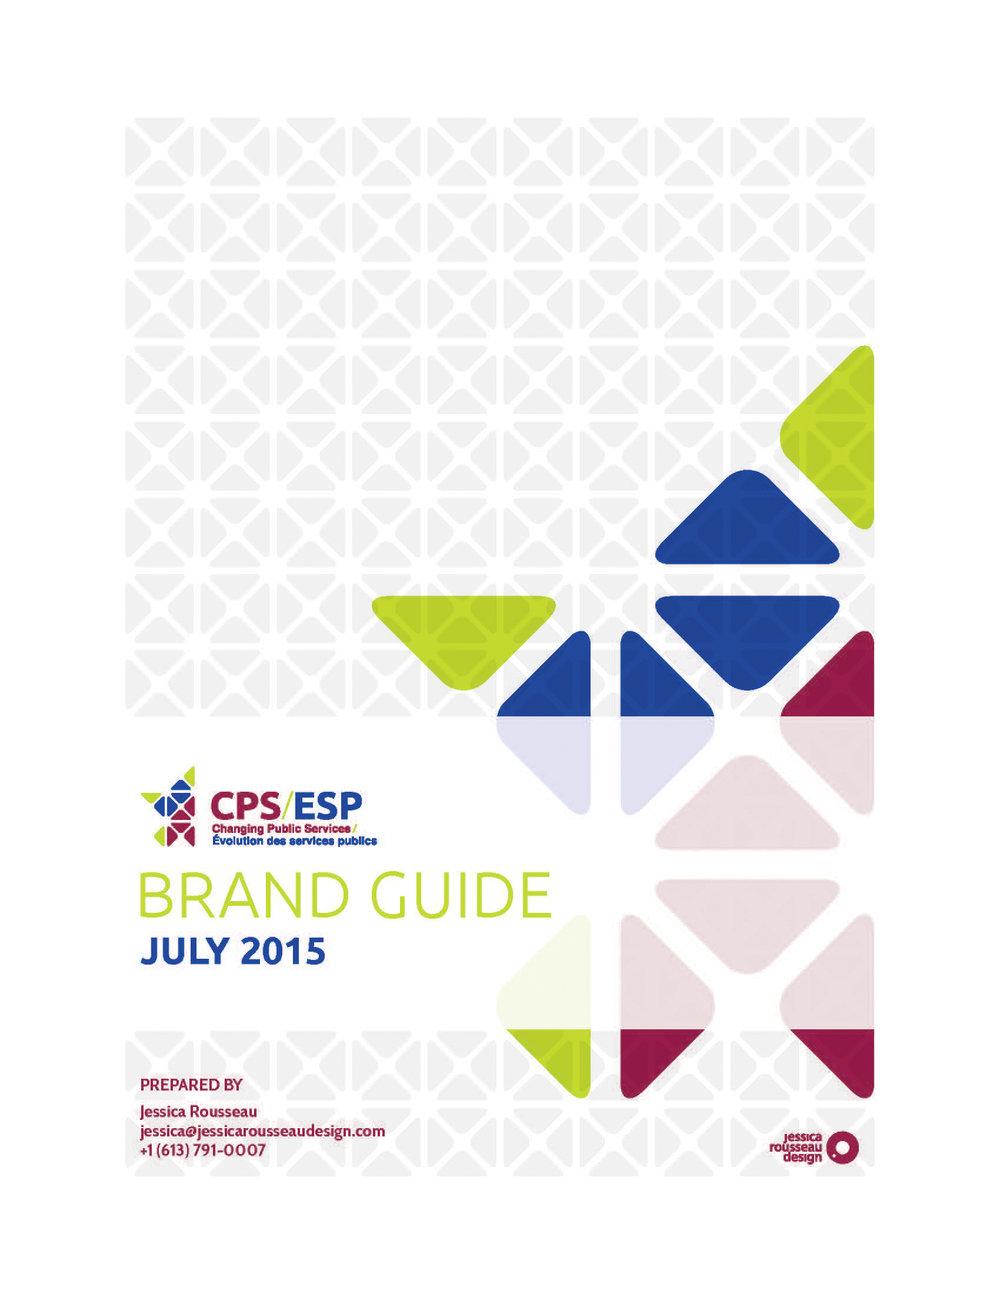 2015-07-10-CPSESP-Brandguide_Page_1.jpg